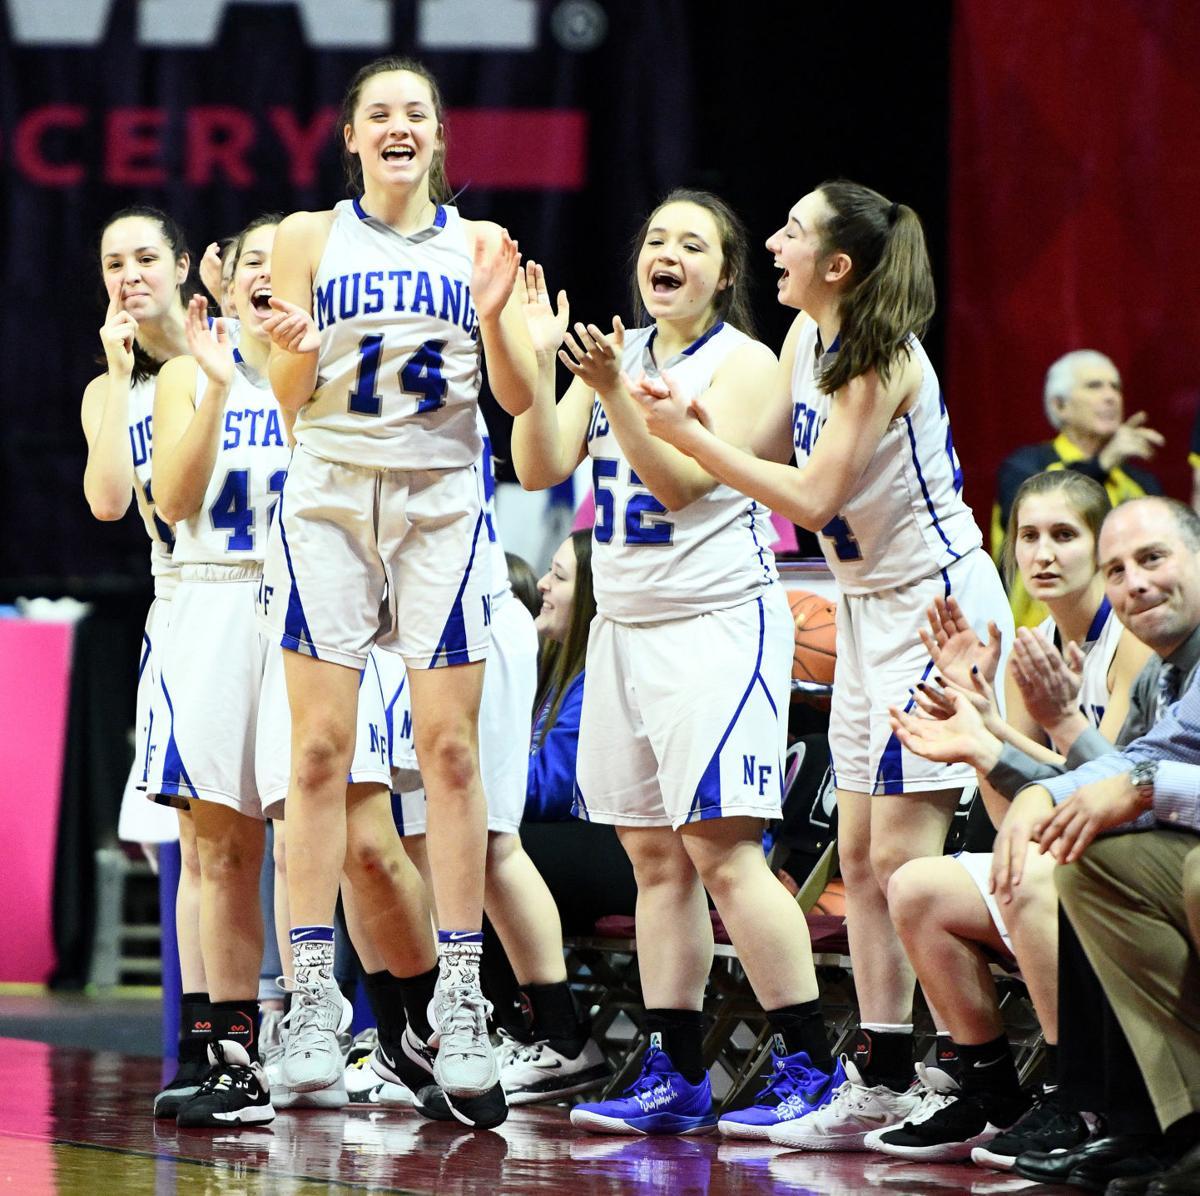 Newell-Fonda vs St. Ansgar state basketball